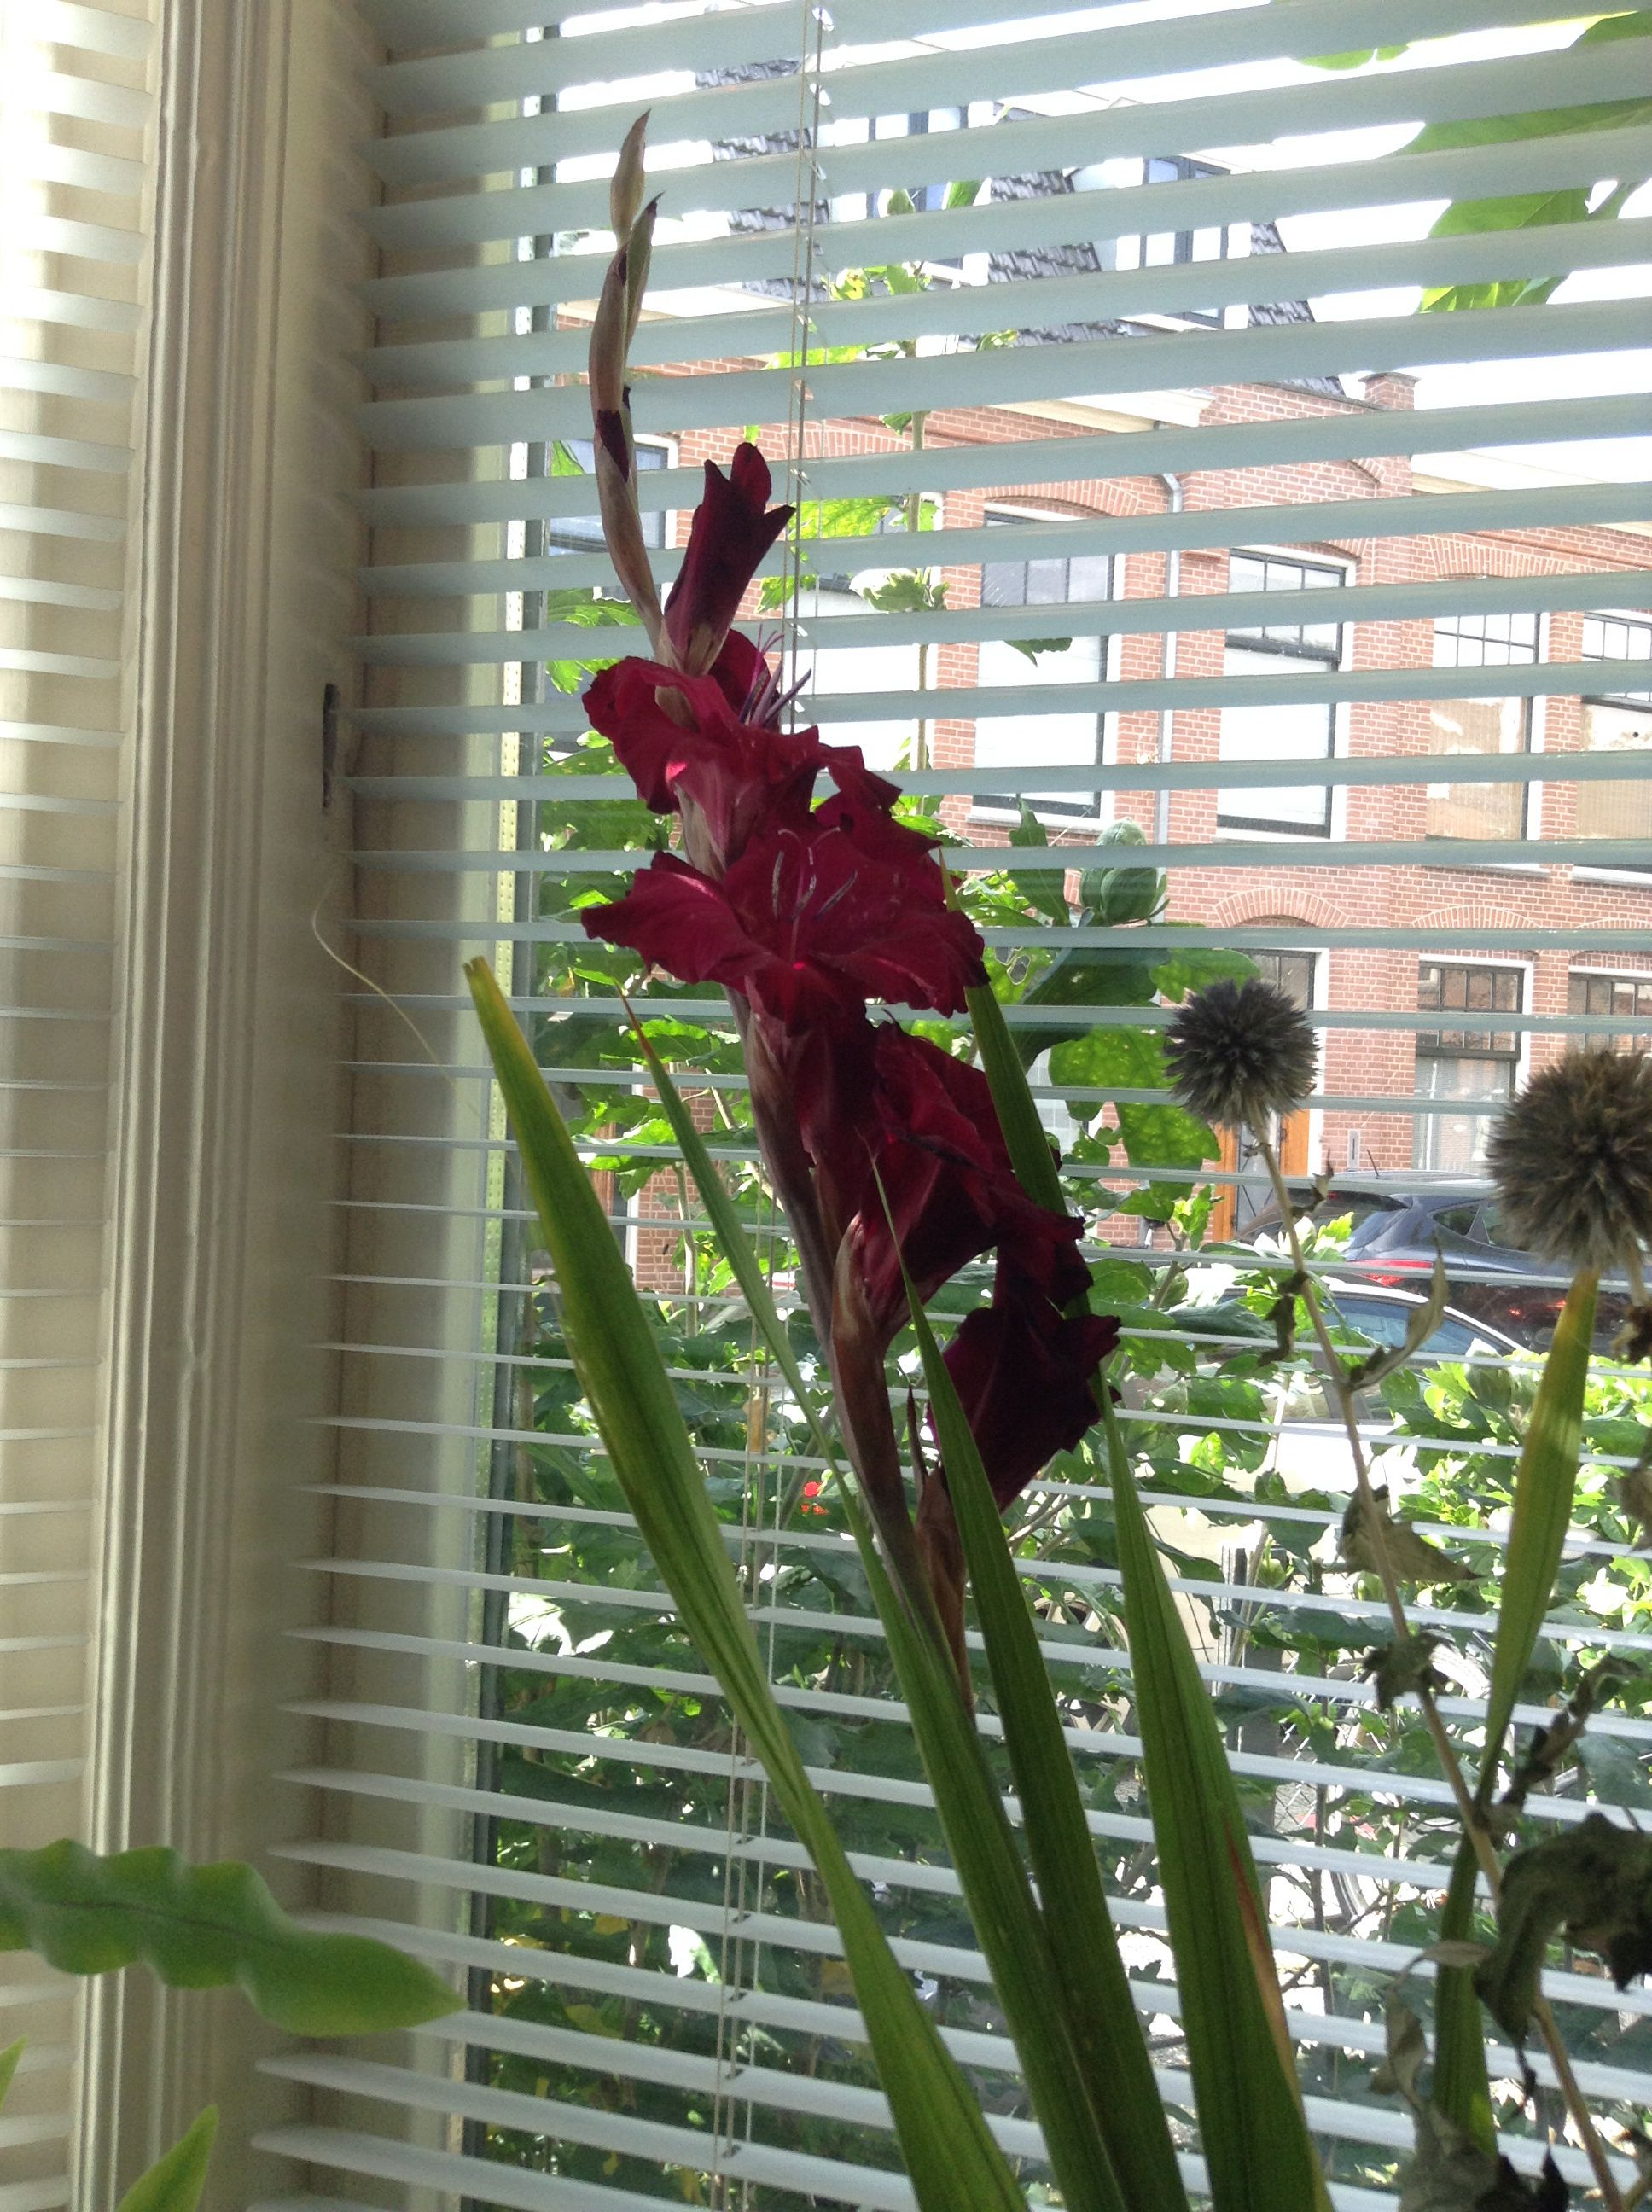 Paarse gladiool uit eigen tuin